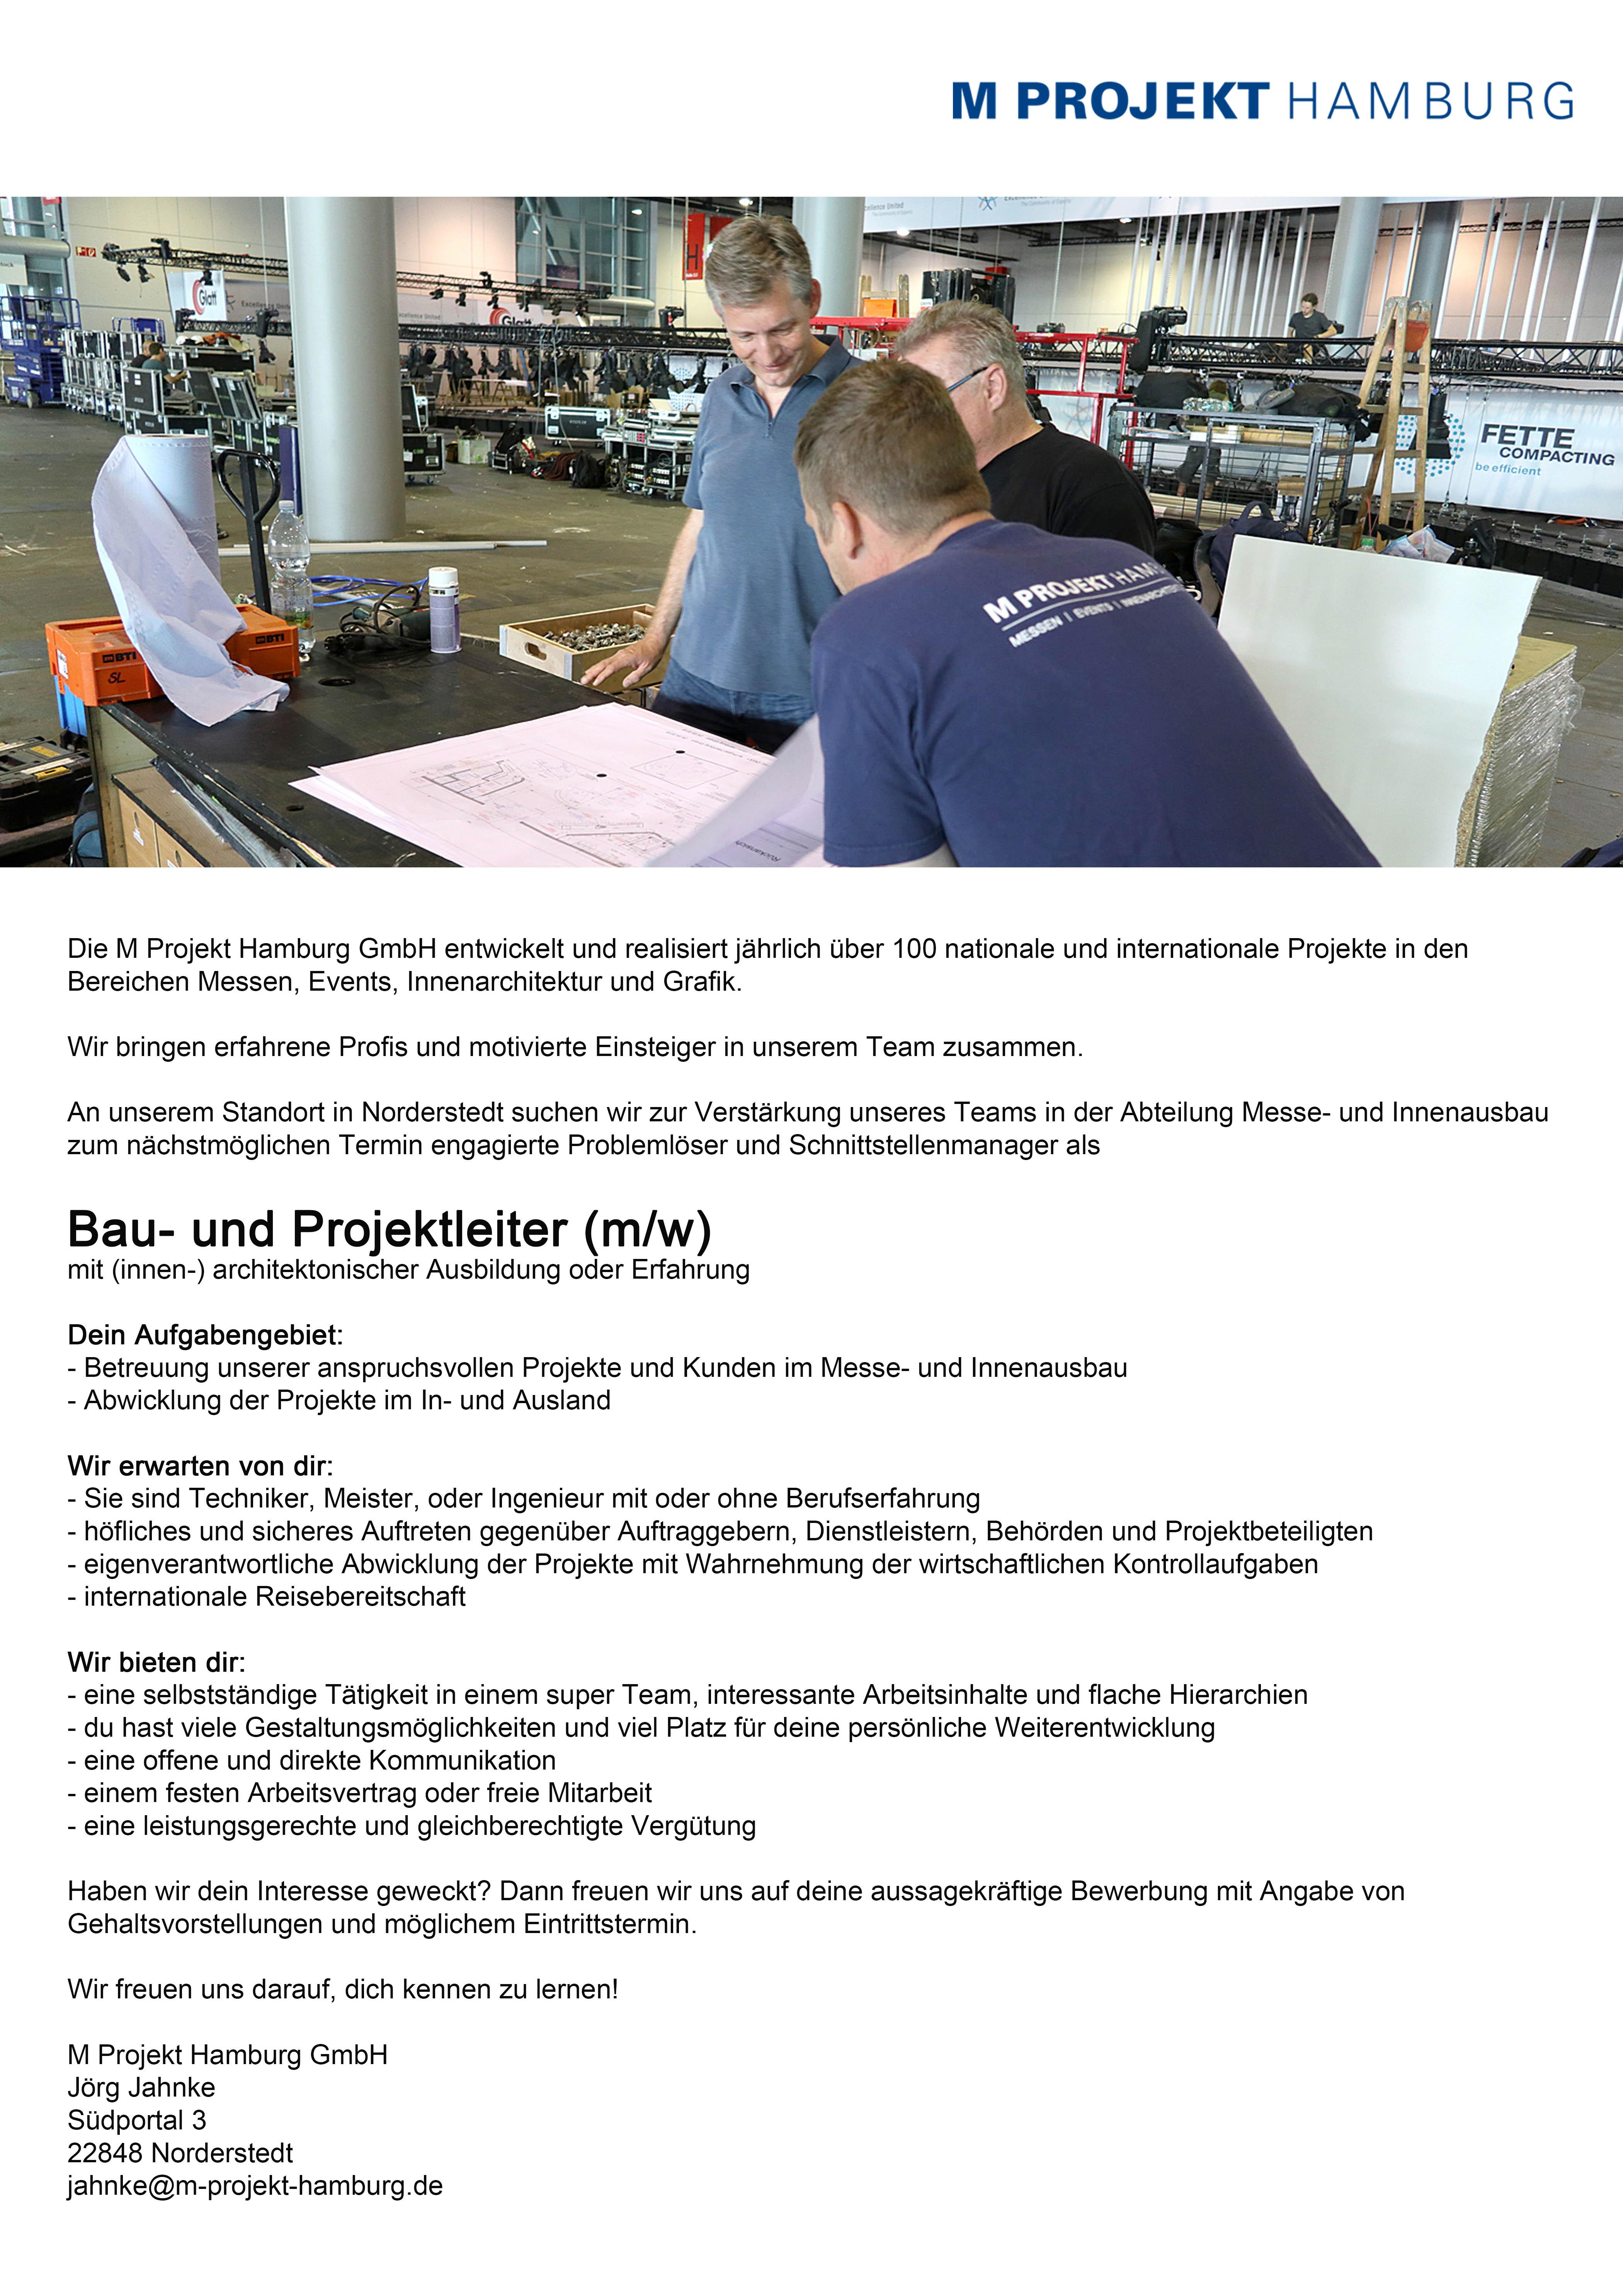 Jobs   M Projekt Hamburg   Messen. Events. Innenarchitektur. Grafik.